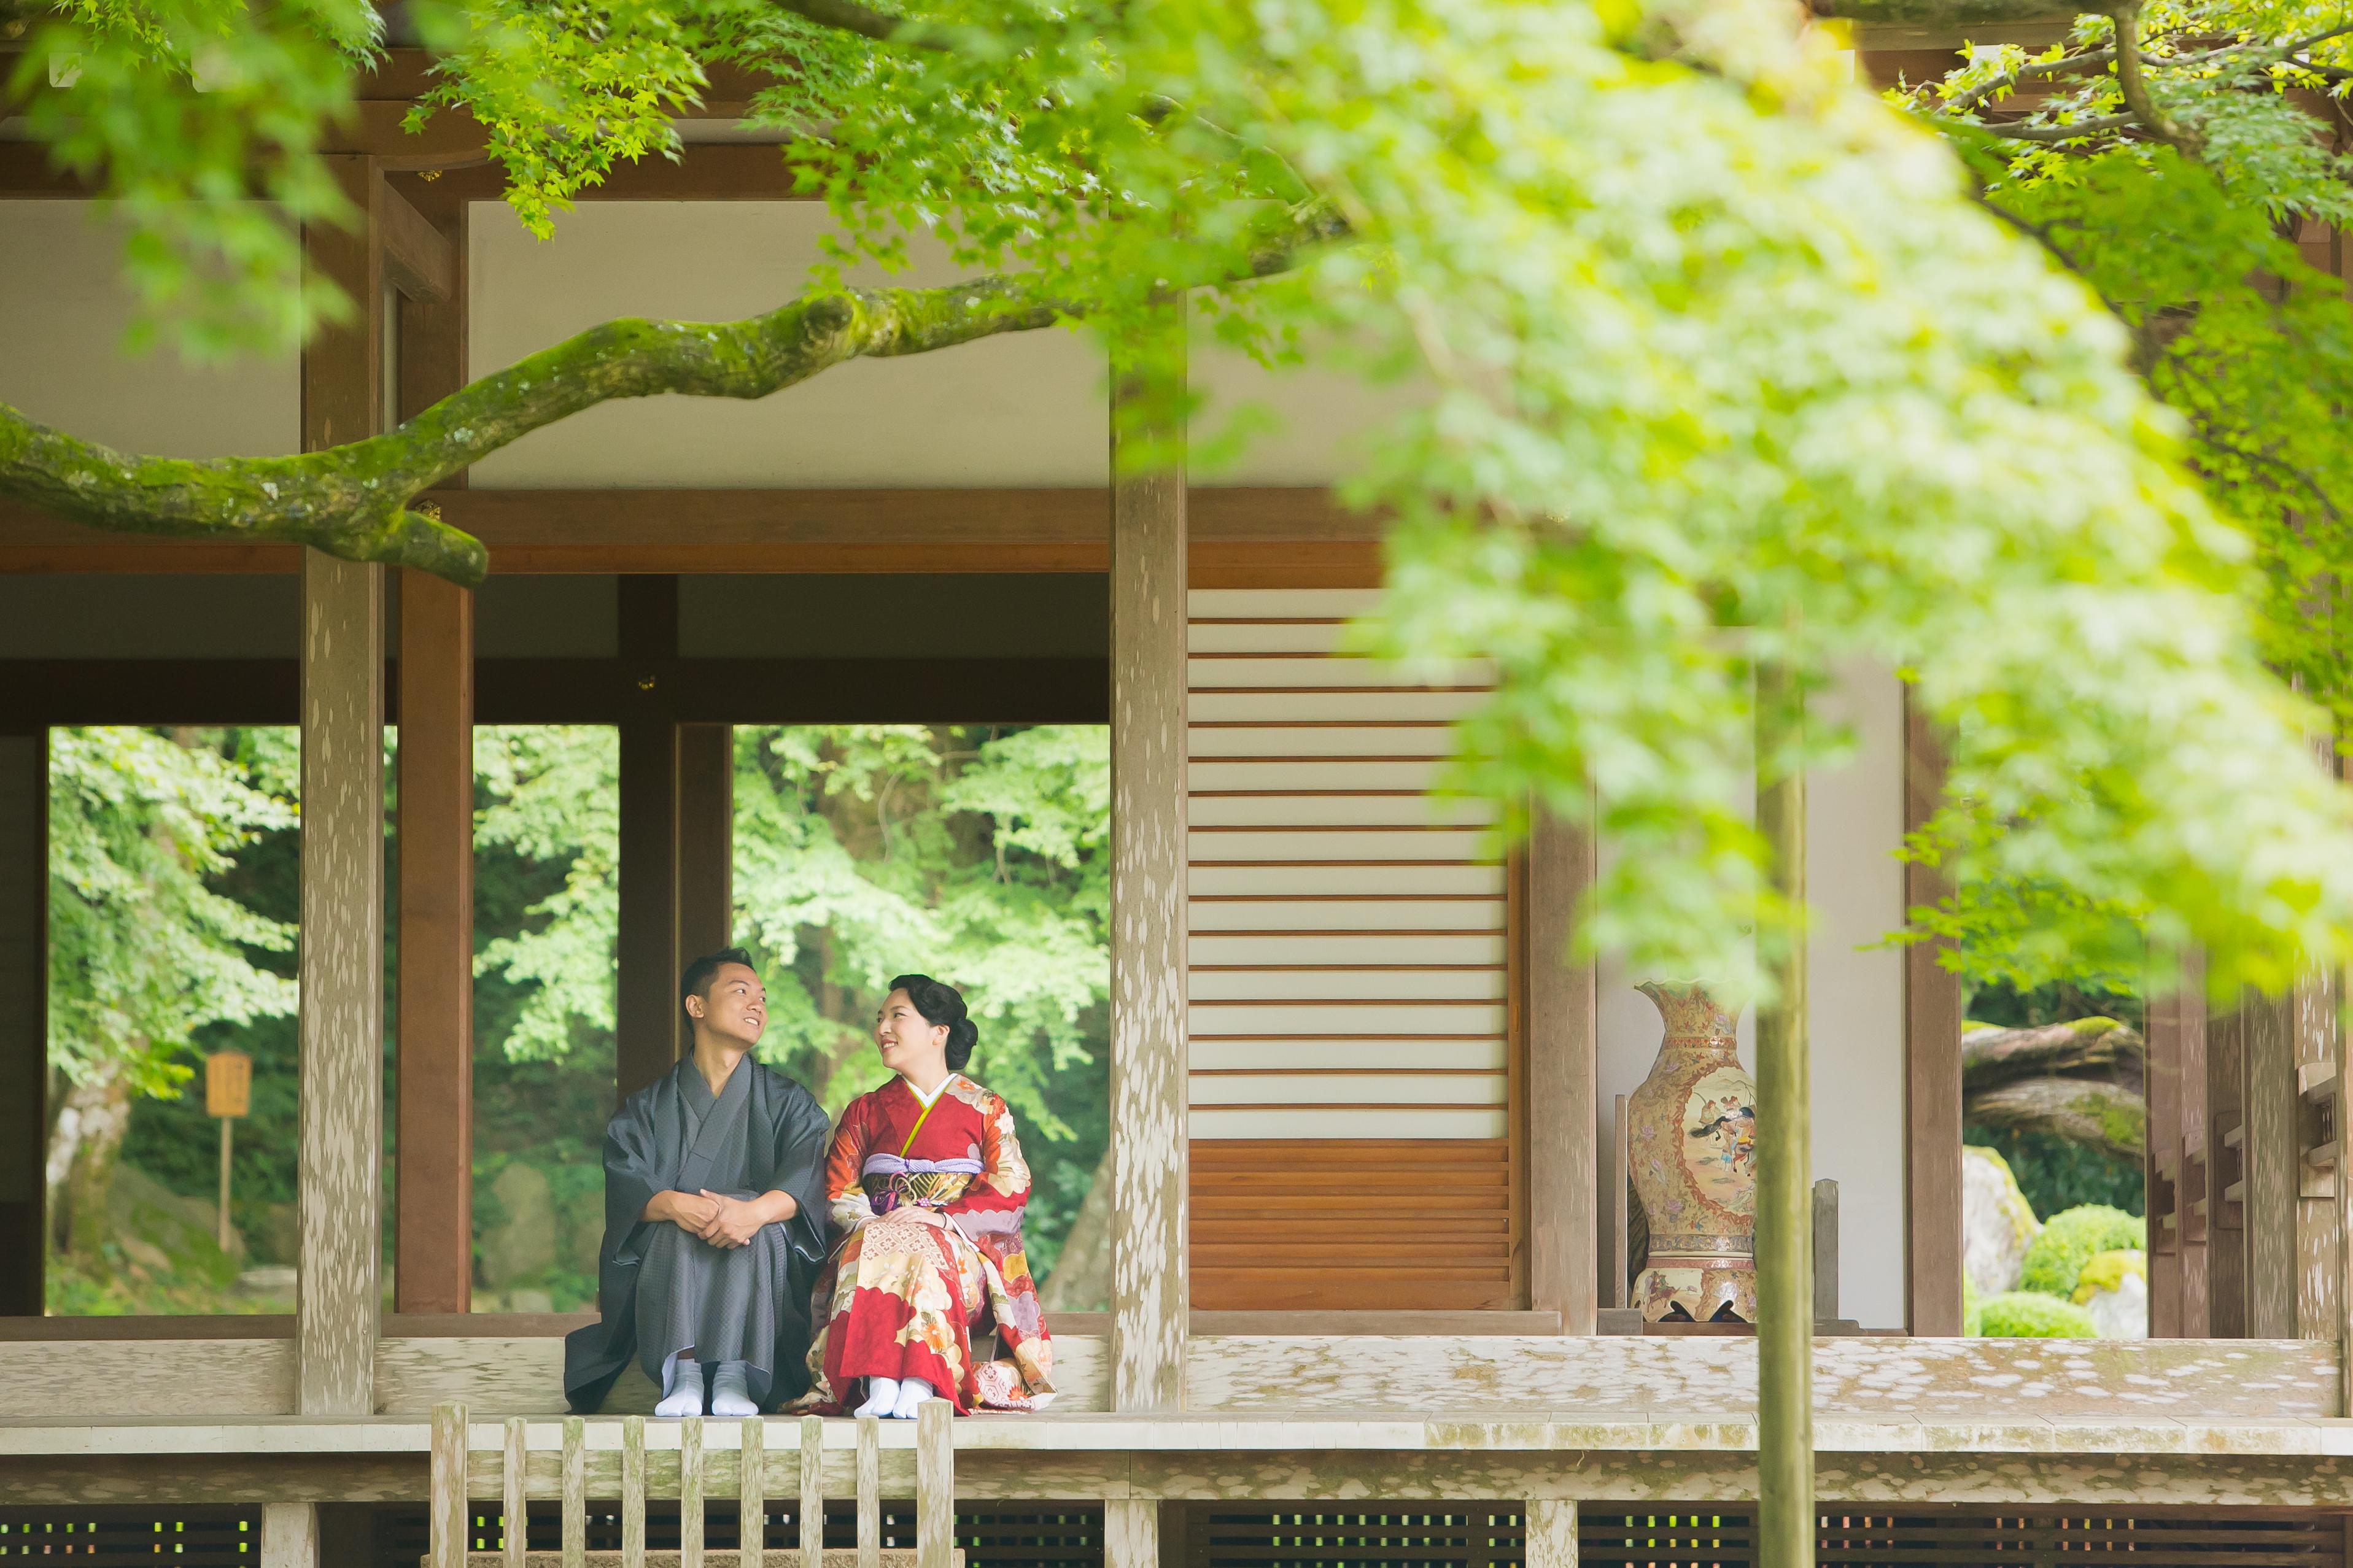 Raizan sennyo ji Temple in Fukuoka